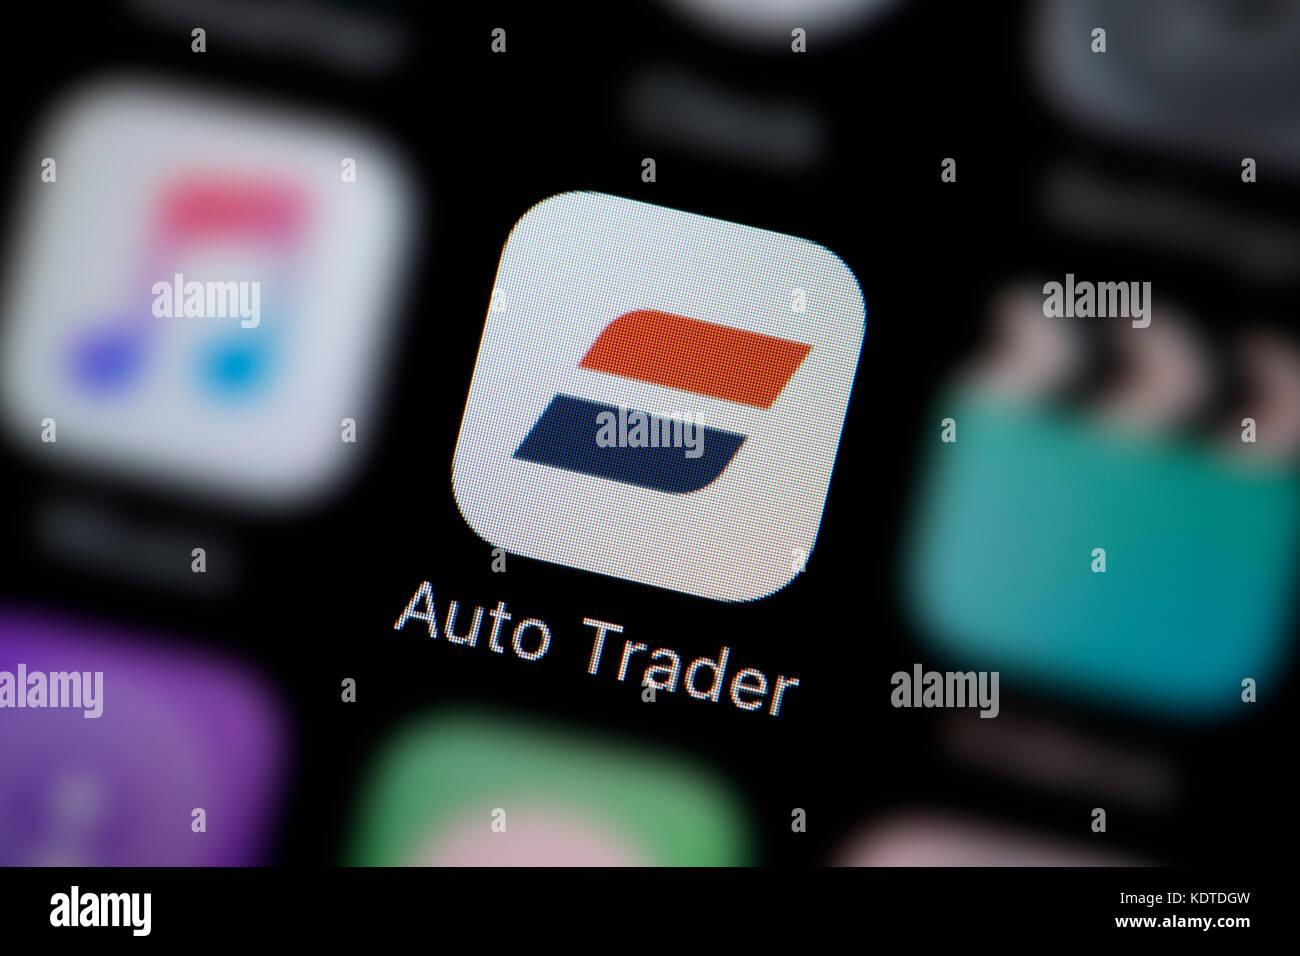 Auto Trader Stock Photos & Auto Trader Stock Images - Alamy